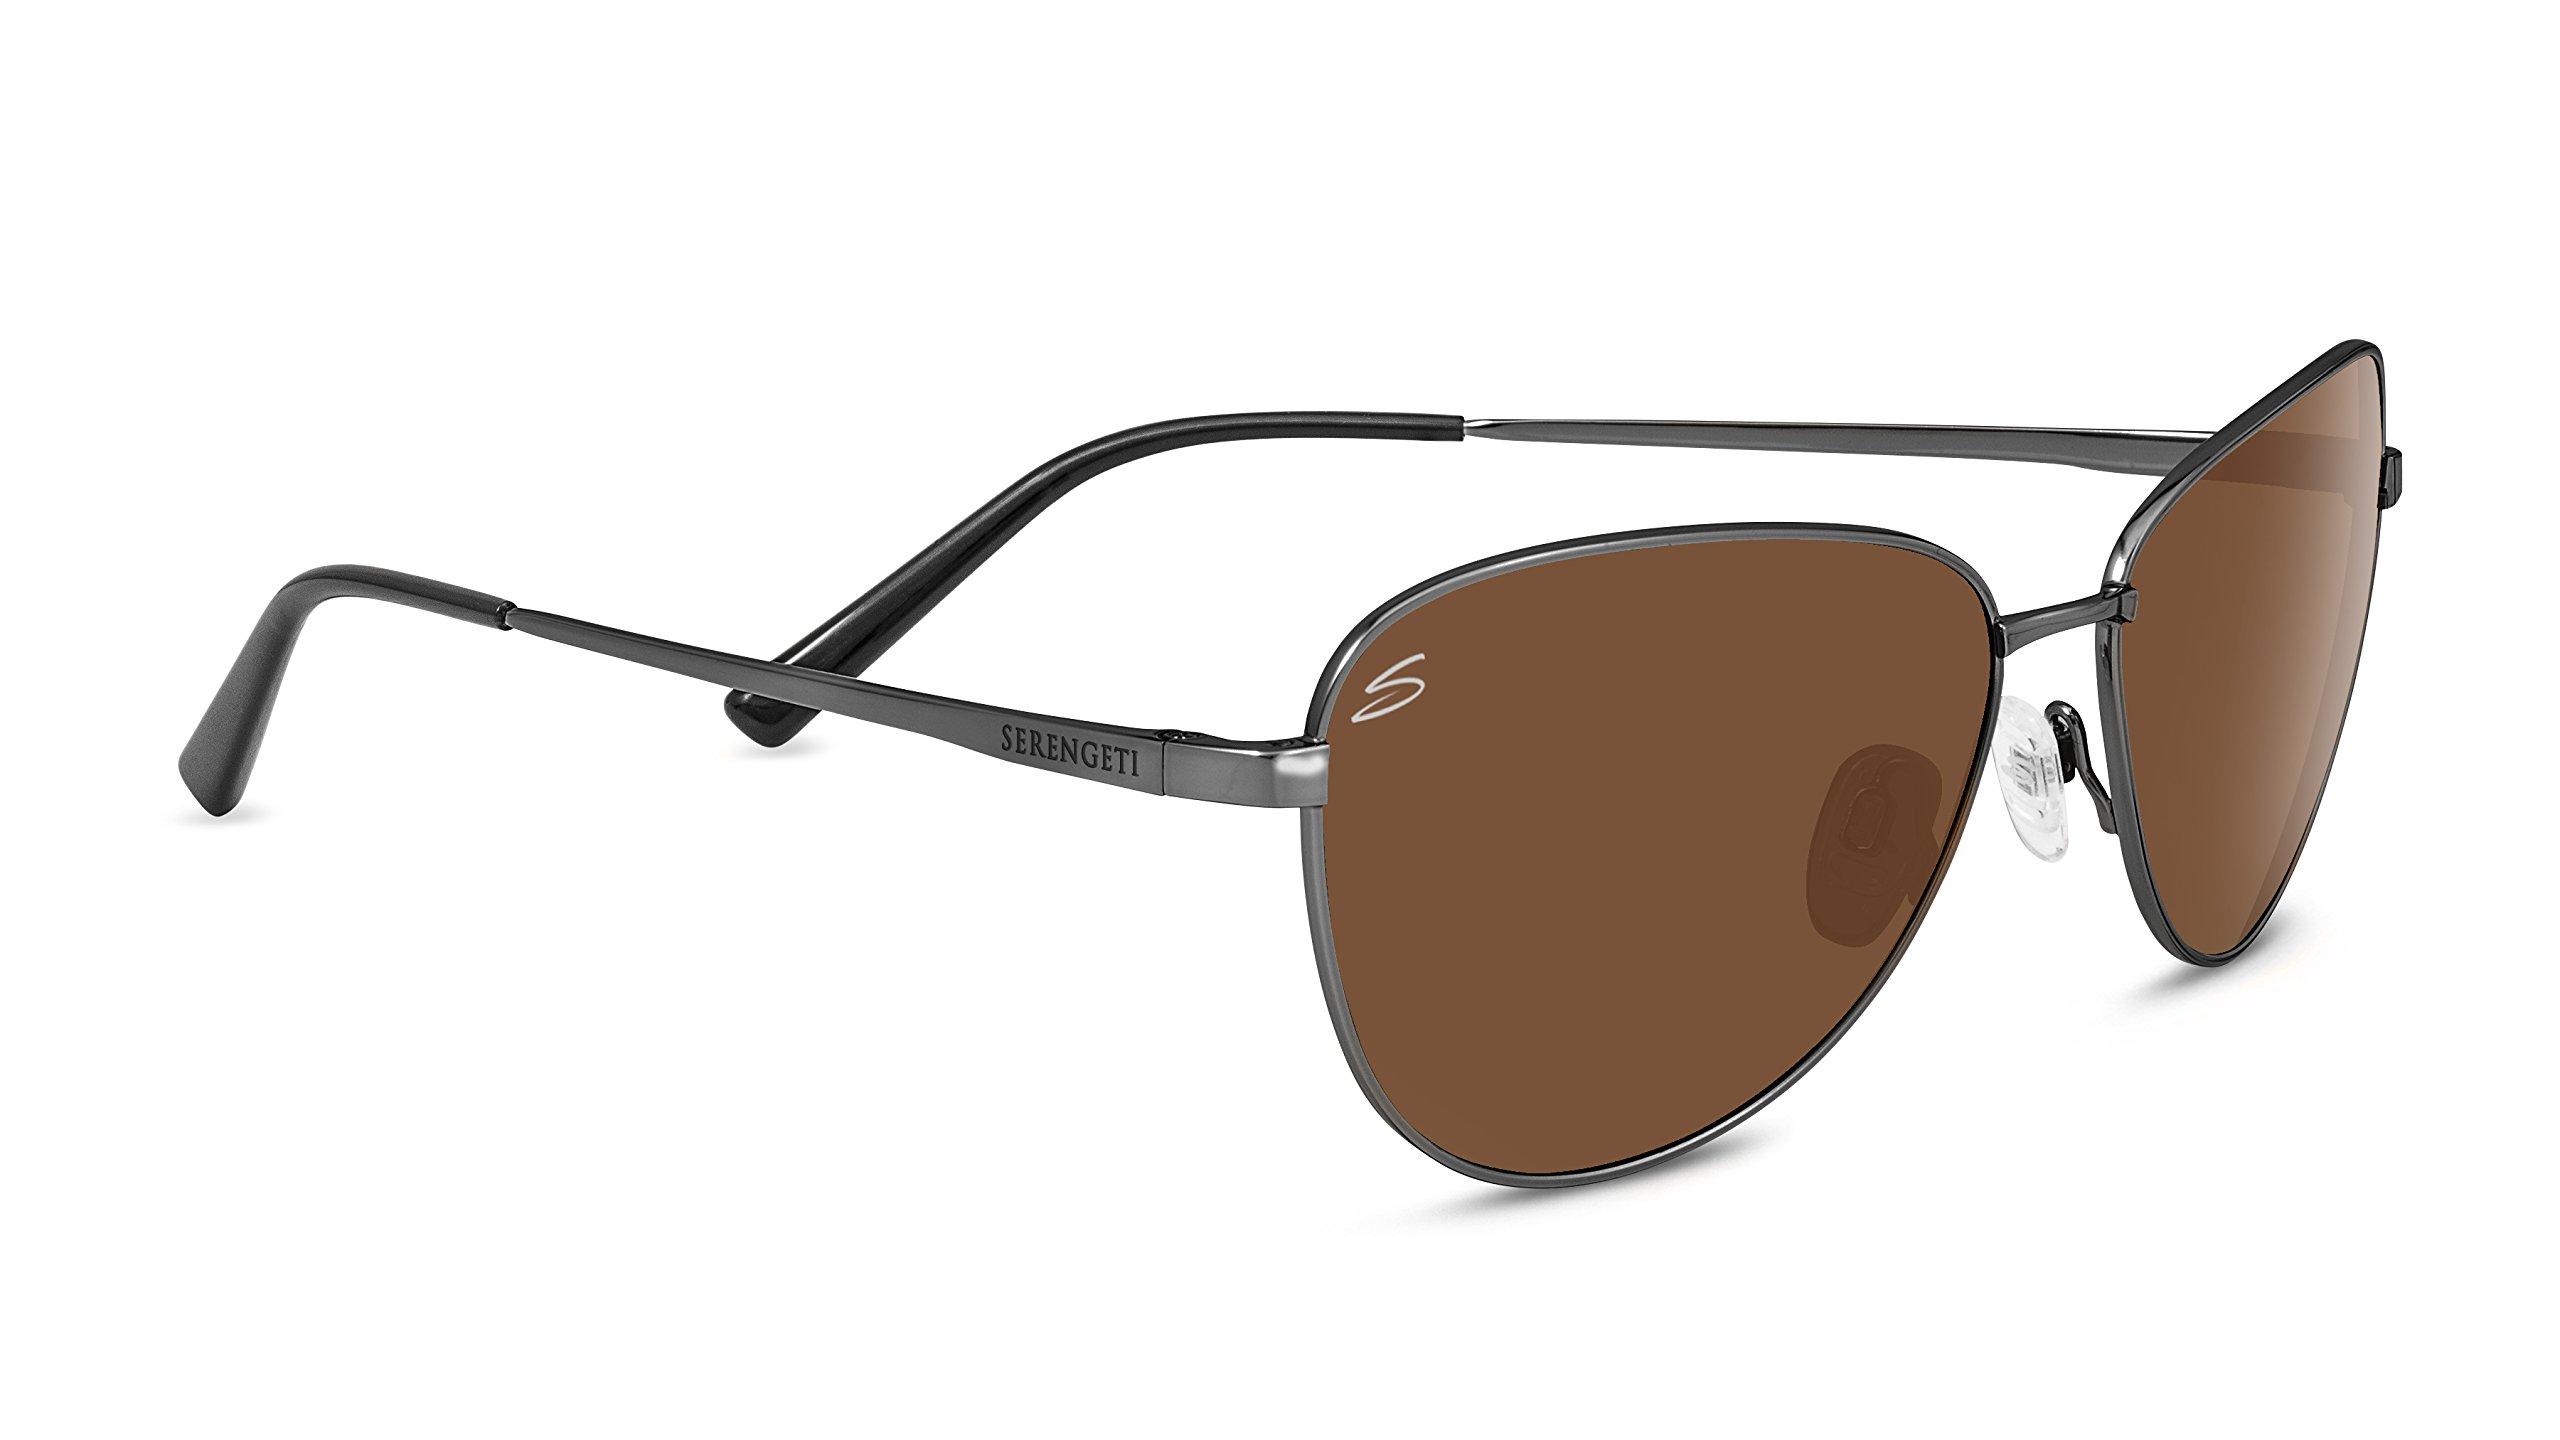 Serengeti 8415 Gloria Polarized Drivers Sunglasses, Shiny Dark Gunmetal by Serengeti (Image #1)